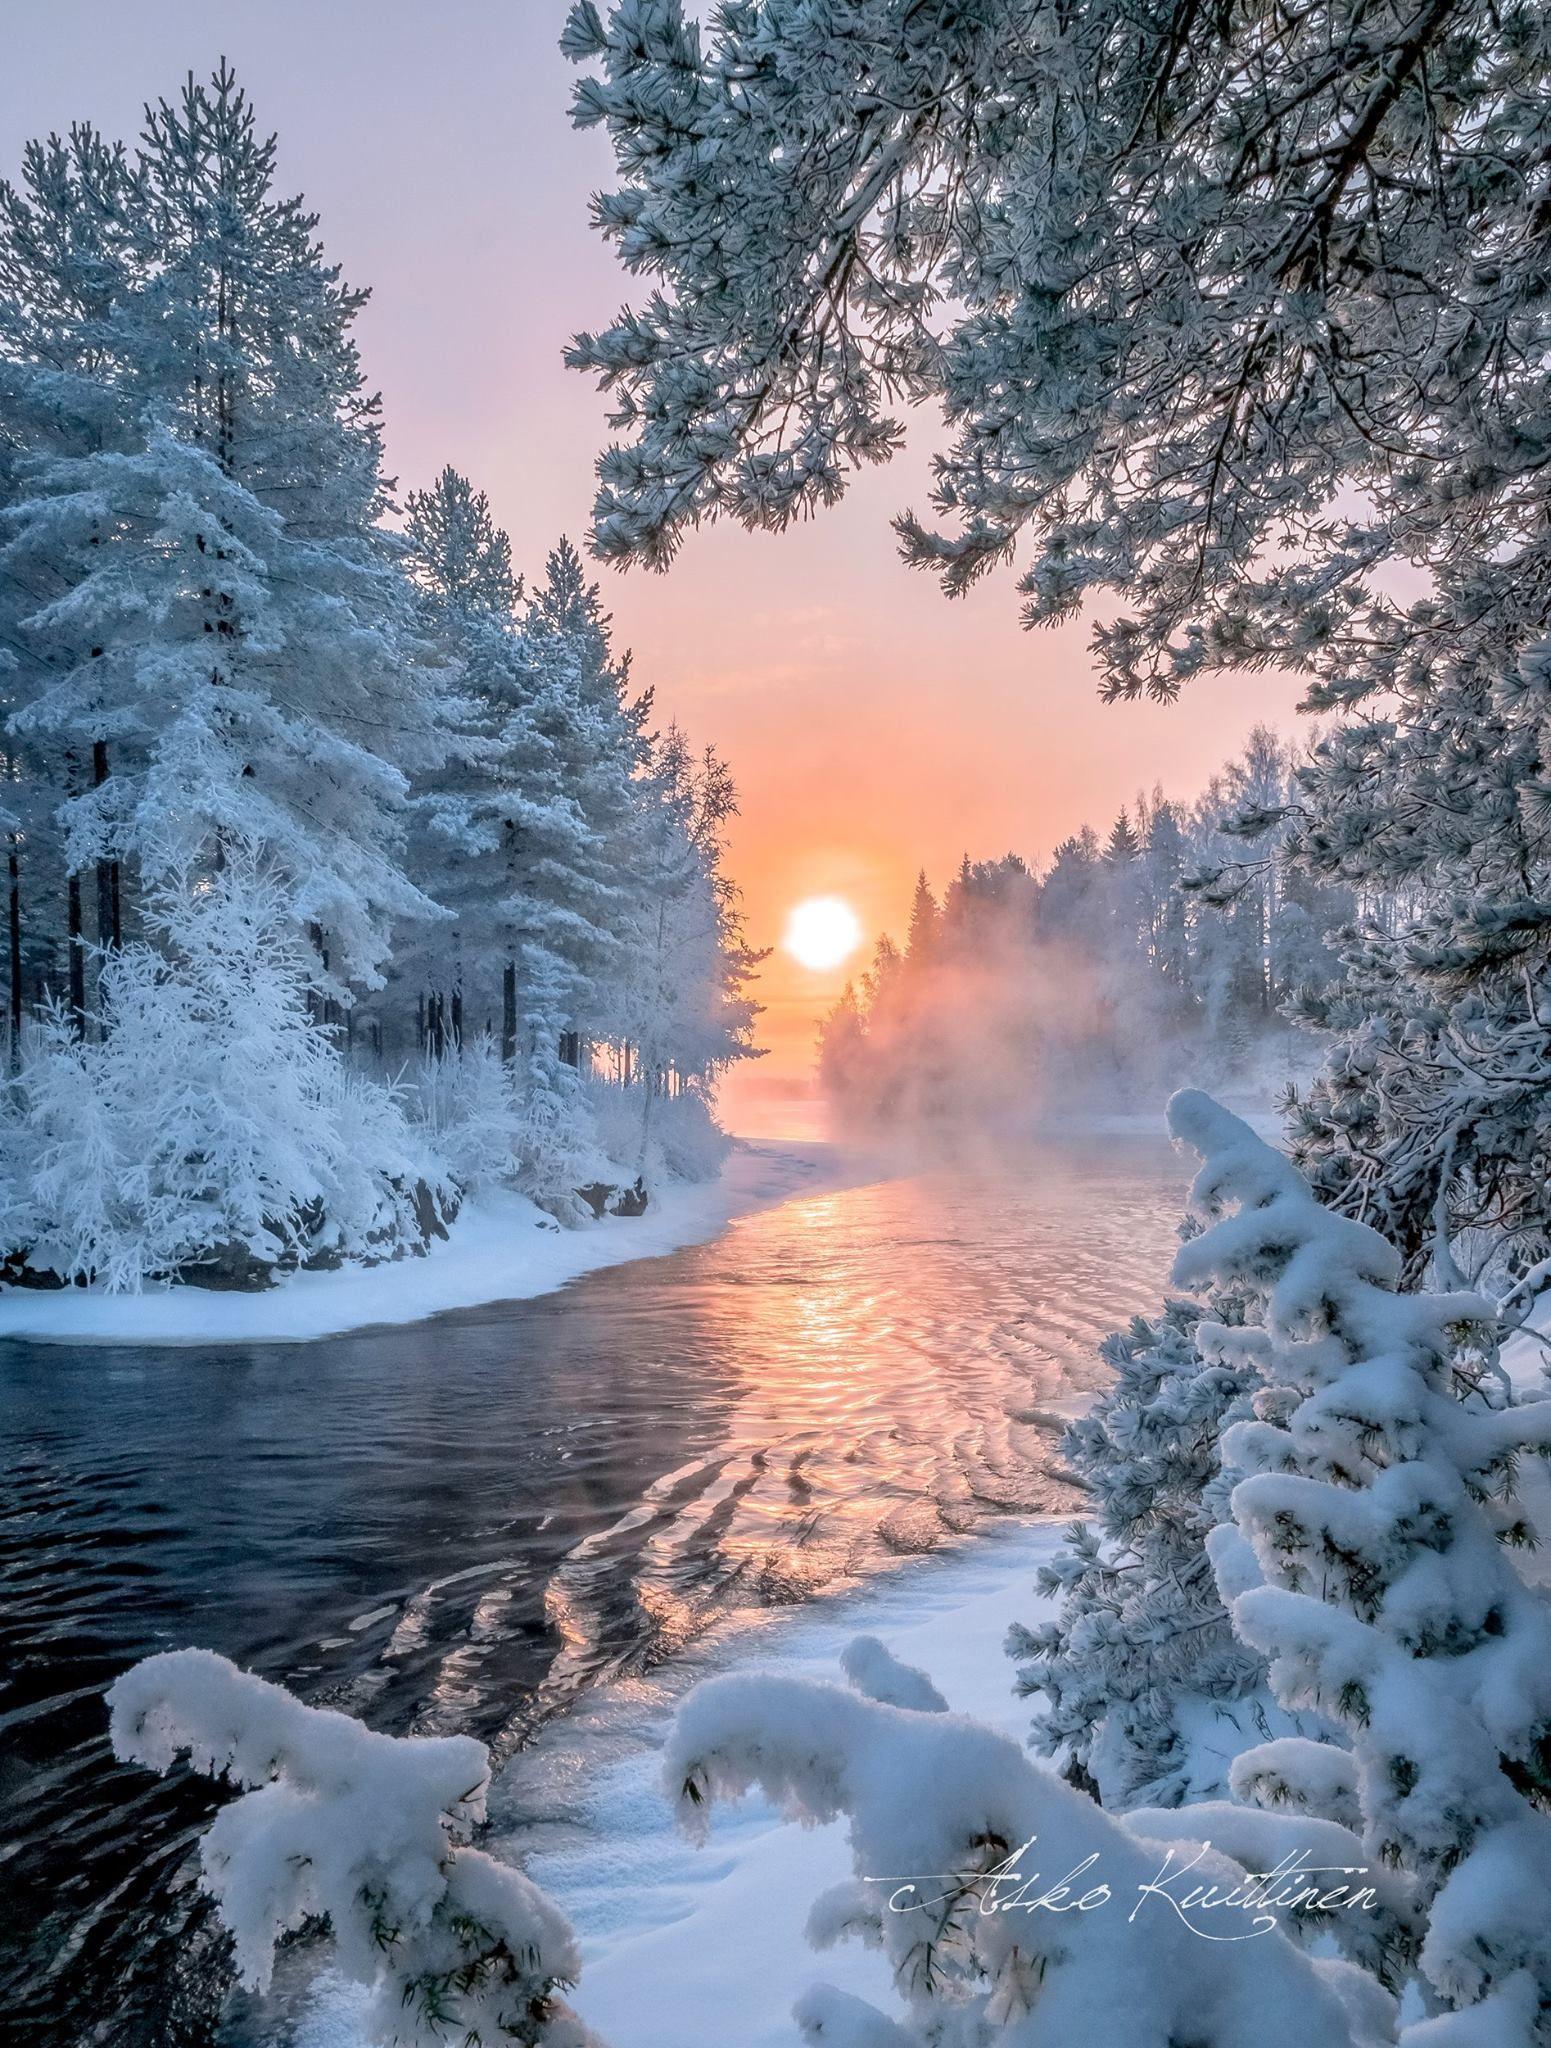 Tammikuun Aurinko Winter Scenery Winter Landscape Winter Pictures